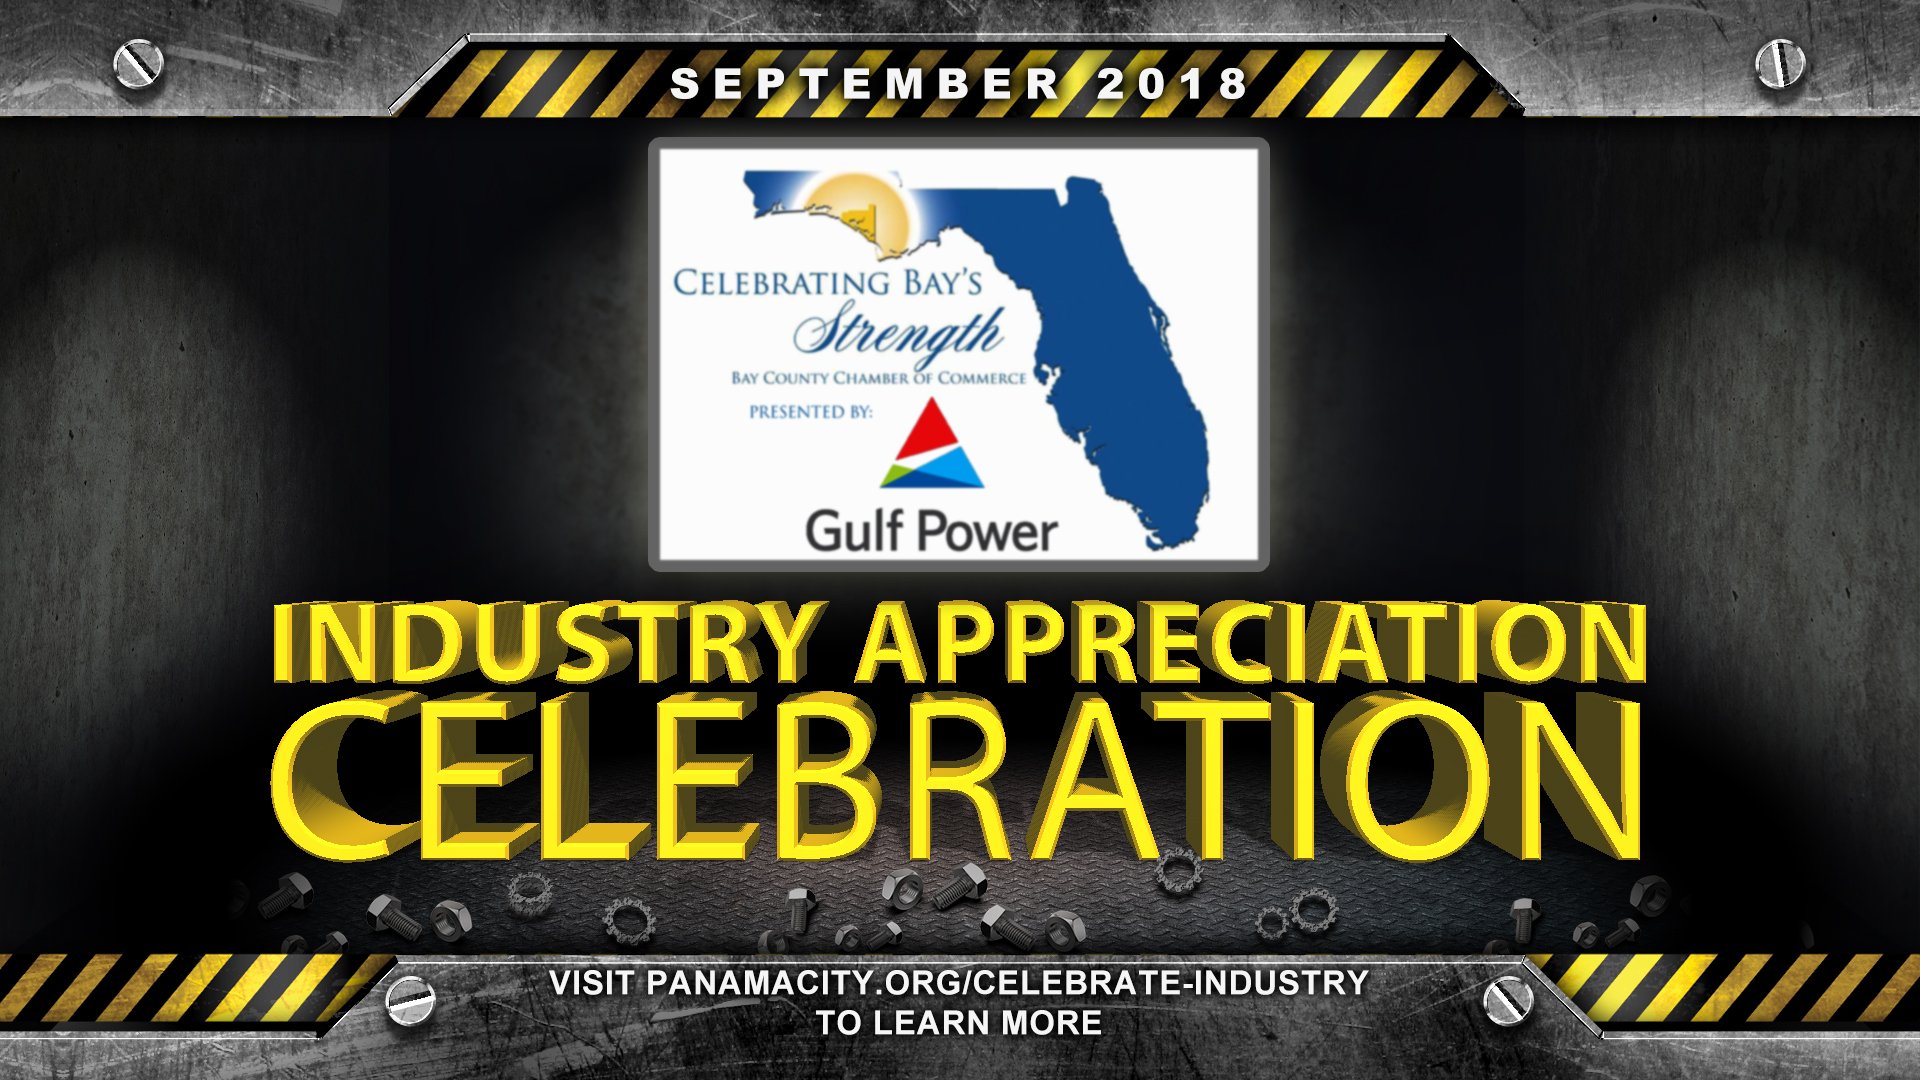 Industry Appreciation Celebration